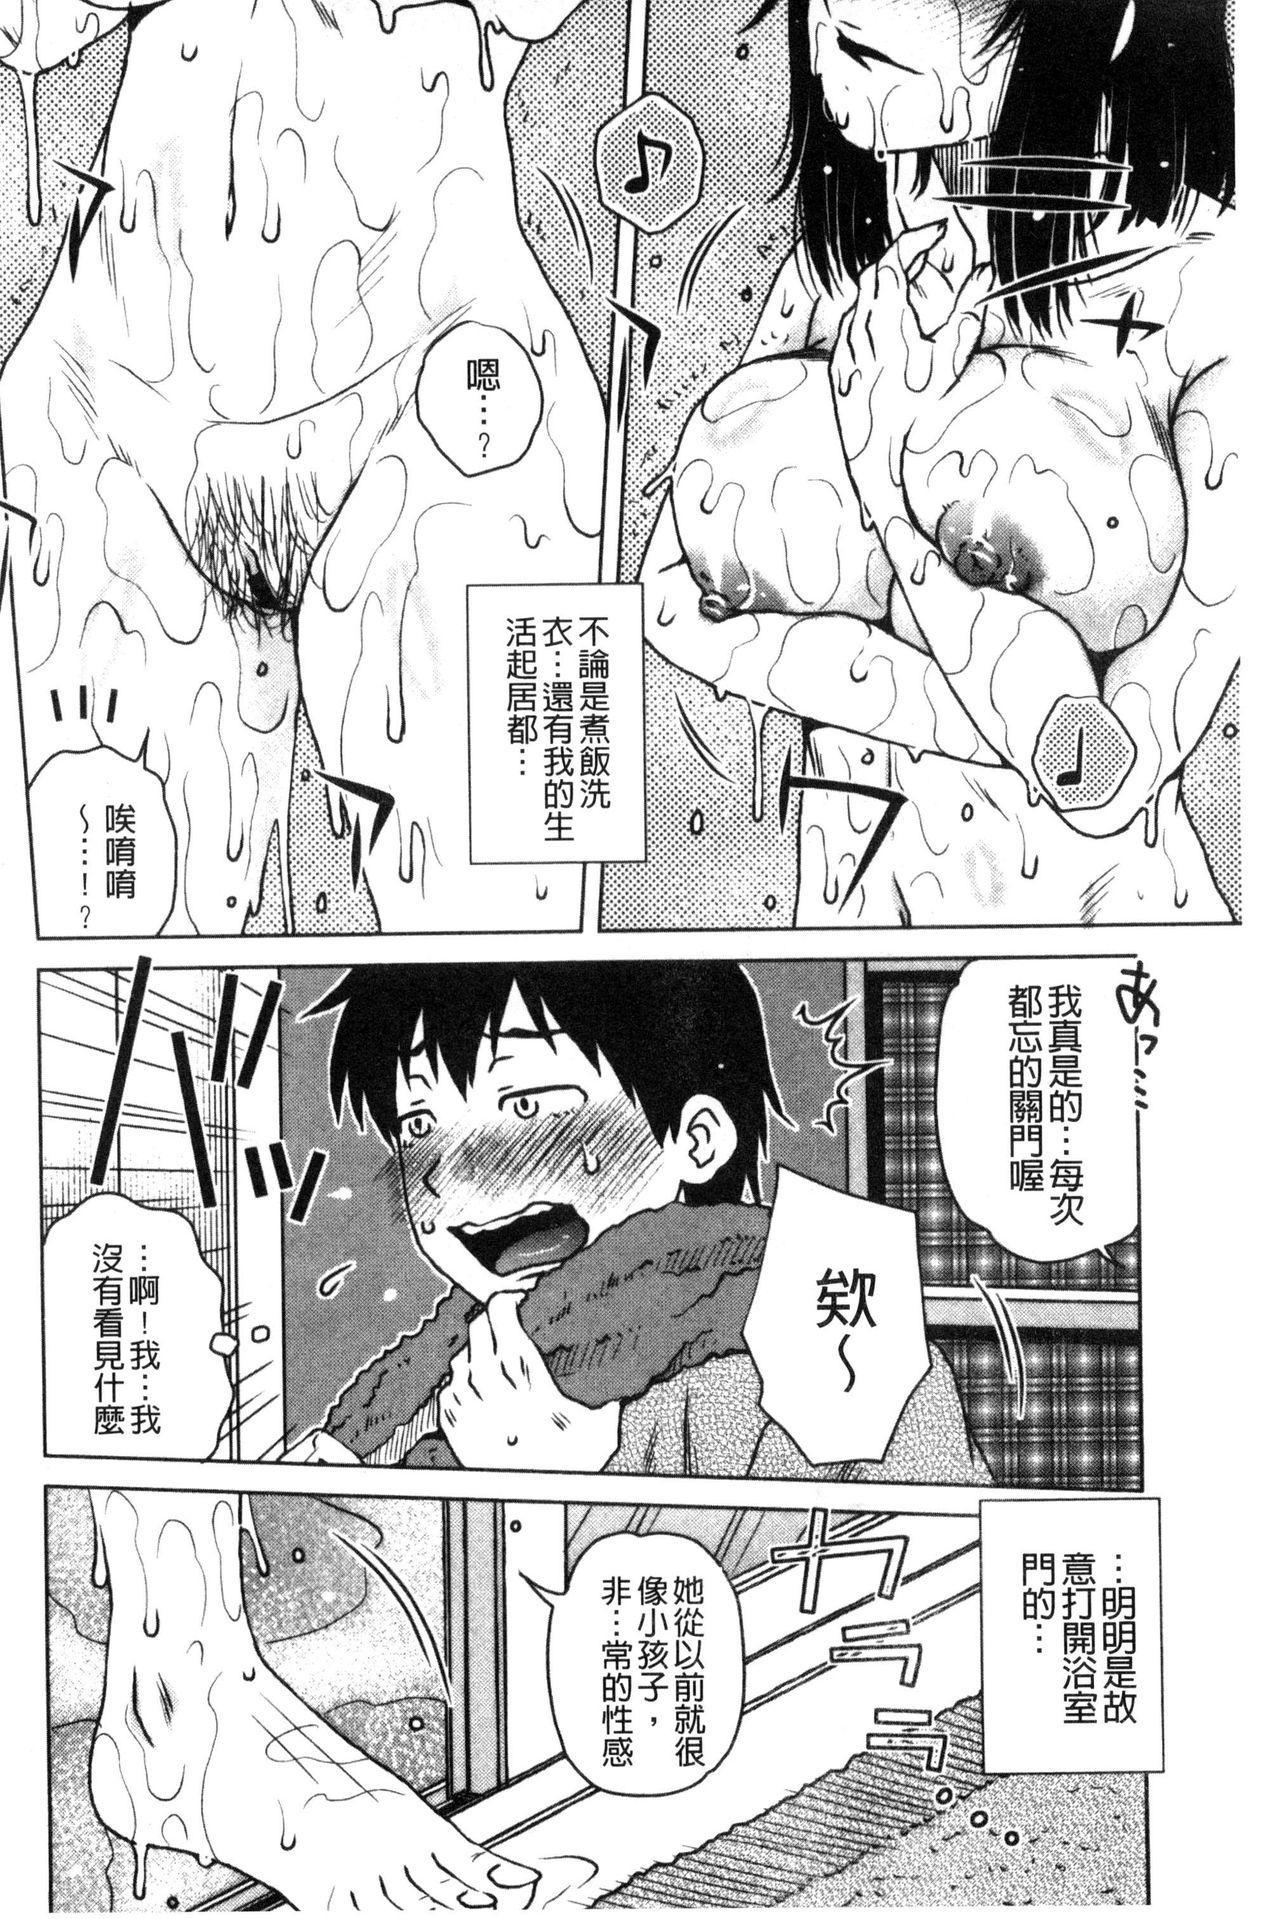 [Kurumiya Mashimin] Uchi no Shachou no Hamedere Inkatsu - Our President is HAME-DERE in Licentious sex life. [Chinese] 108